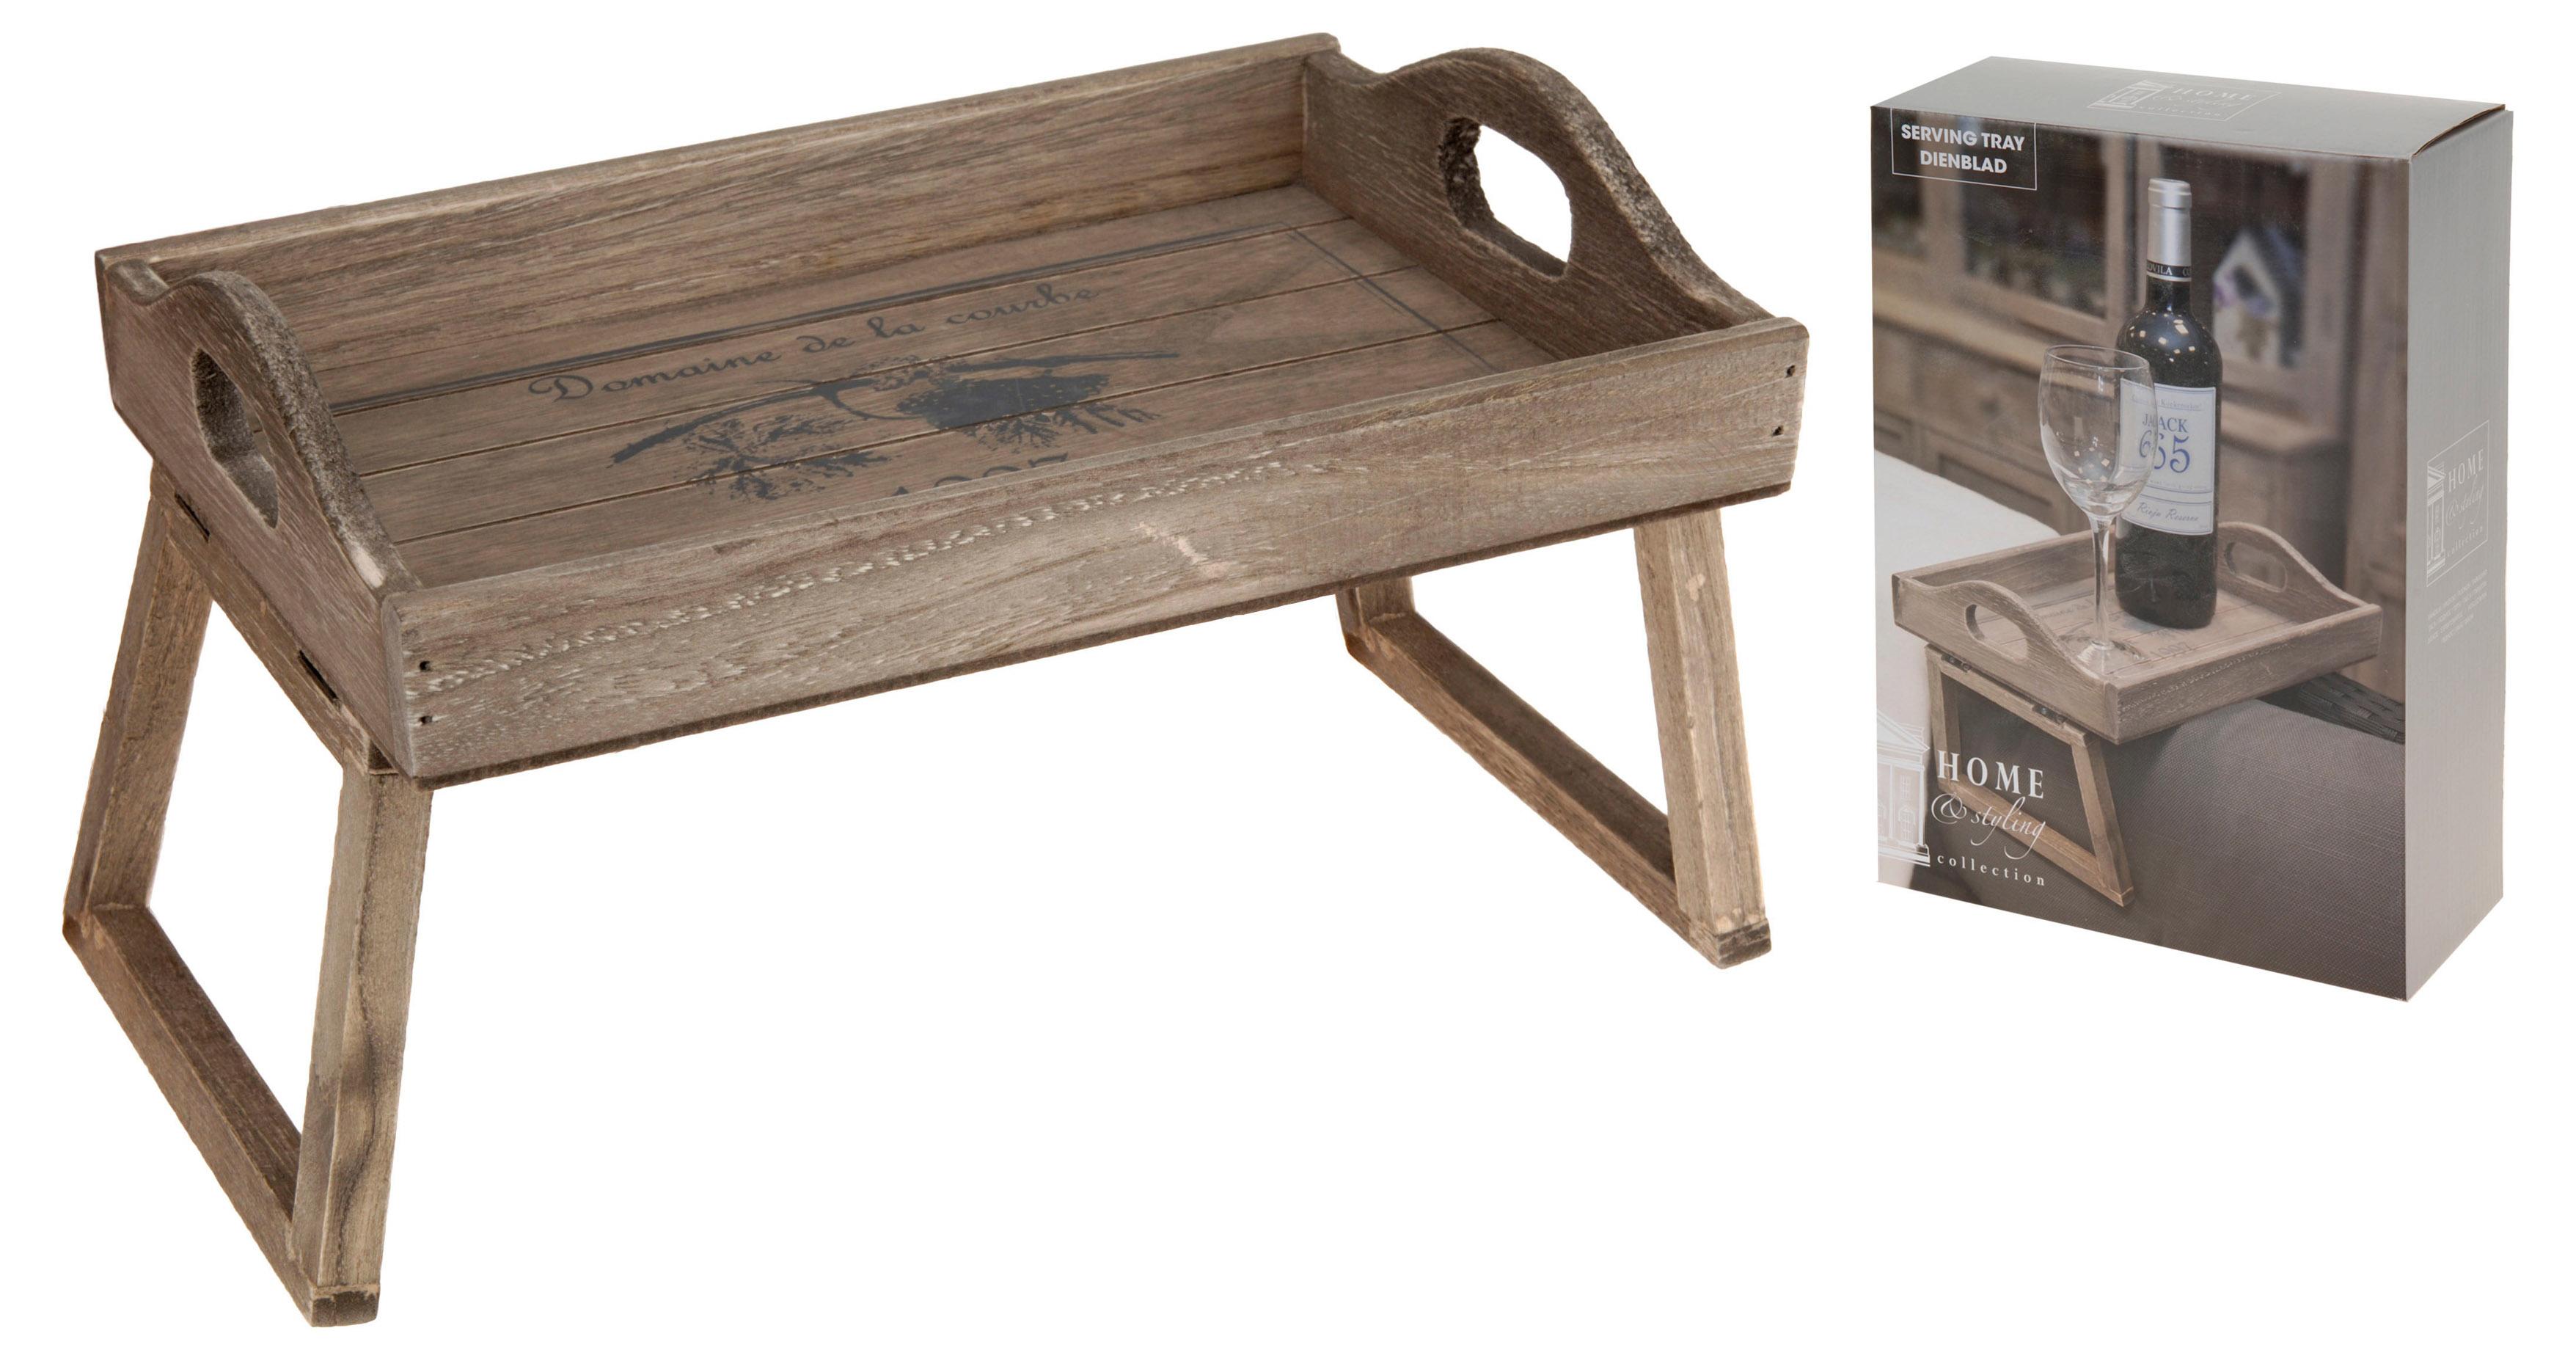 holztablett sofa bett im landhausstil sofatablett beistelltisch couchtablett ebay. Black Bedroom Furniture Sets. Home Design Ideas